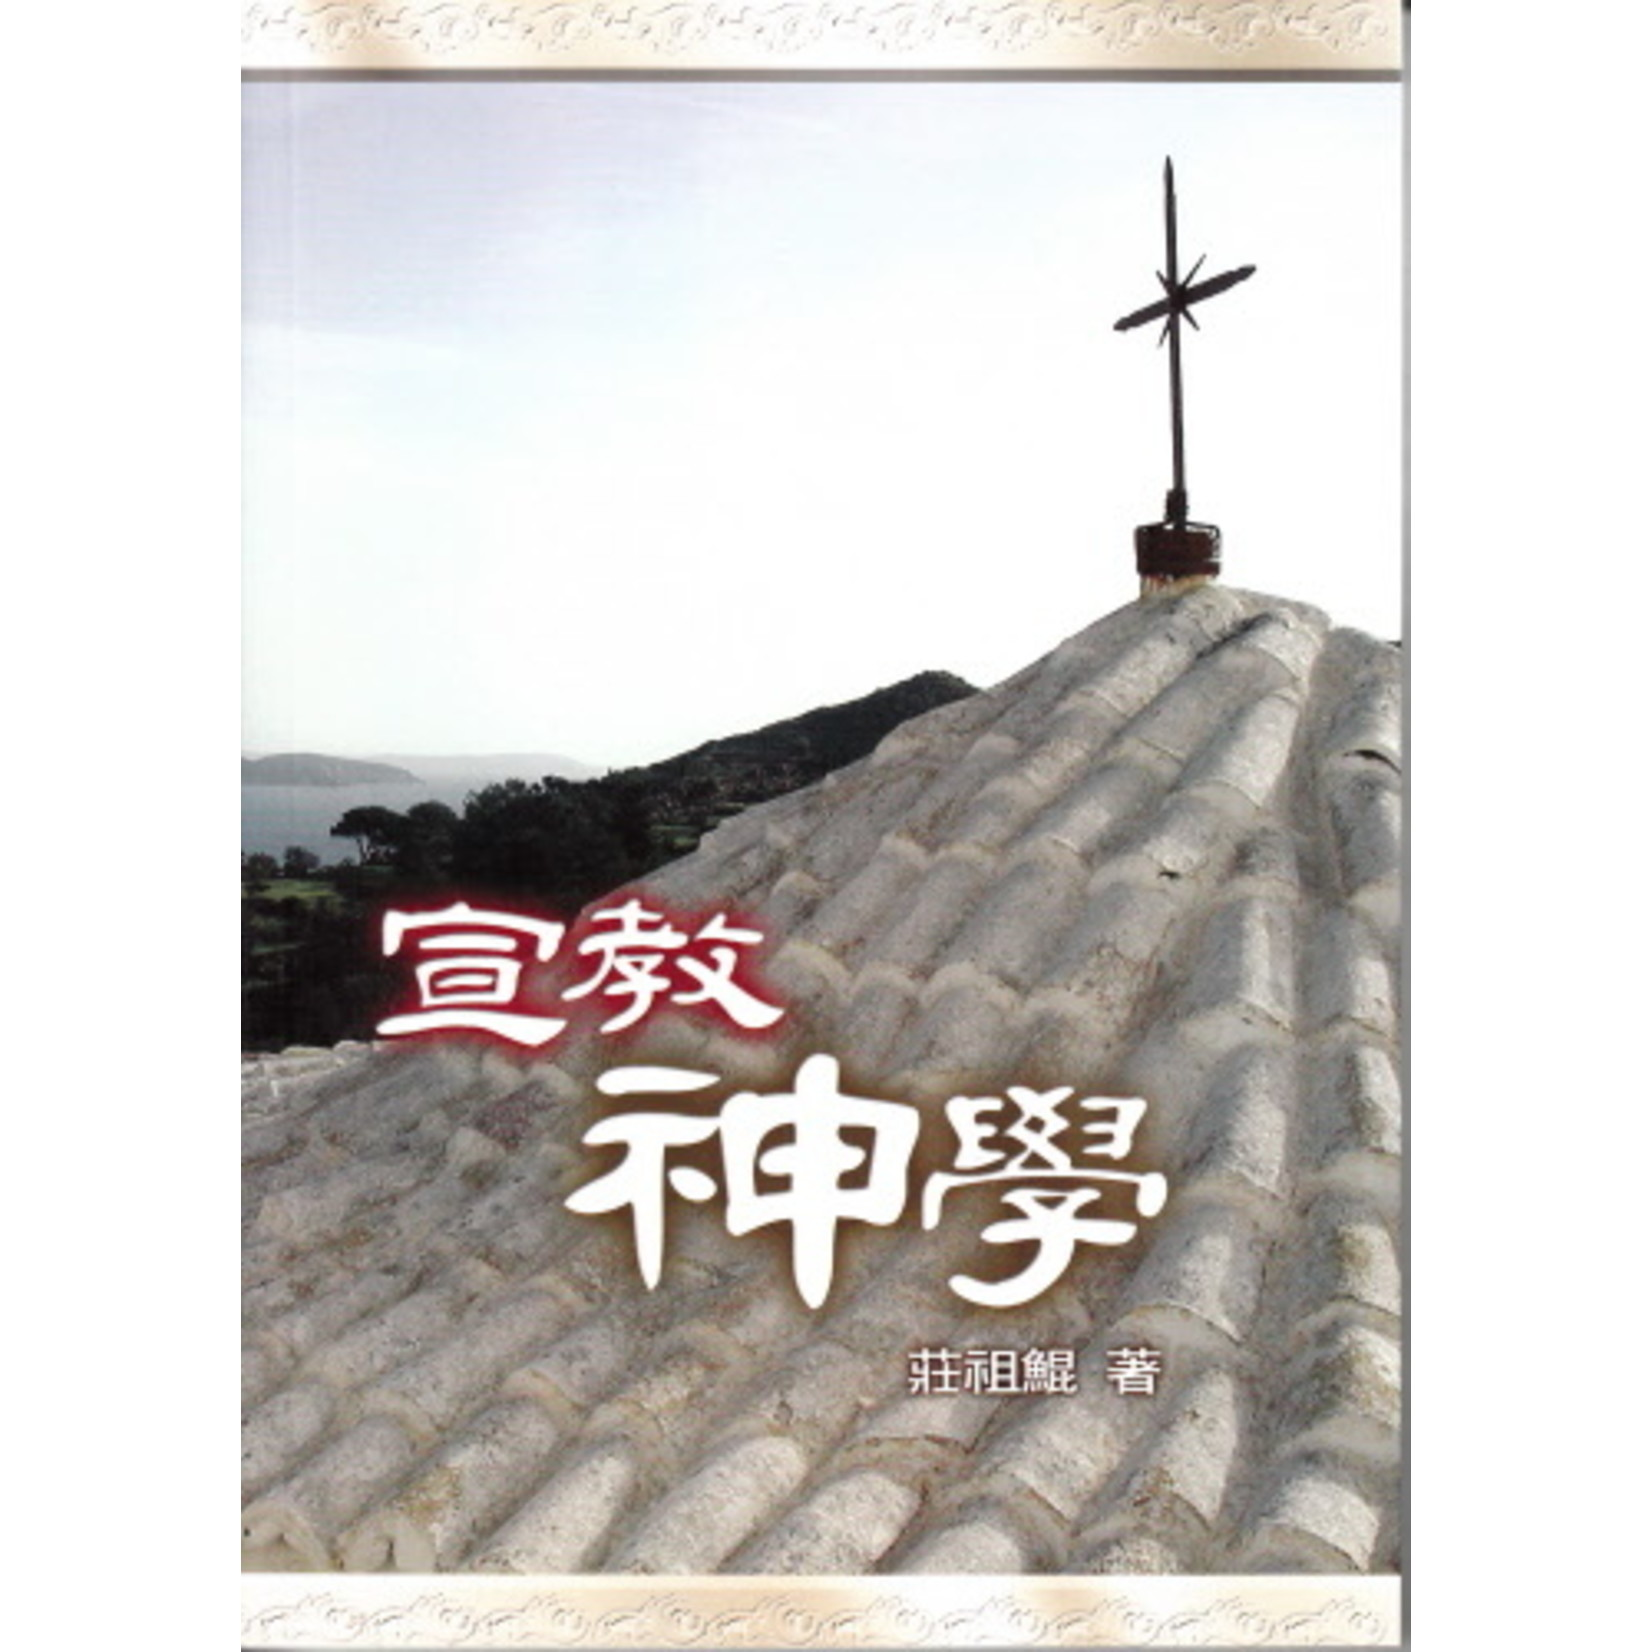 基督使者協會 Ambassadors for Christ 宣教神學